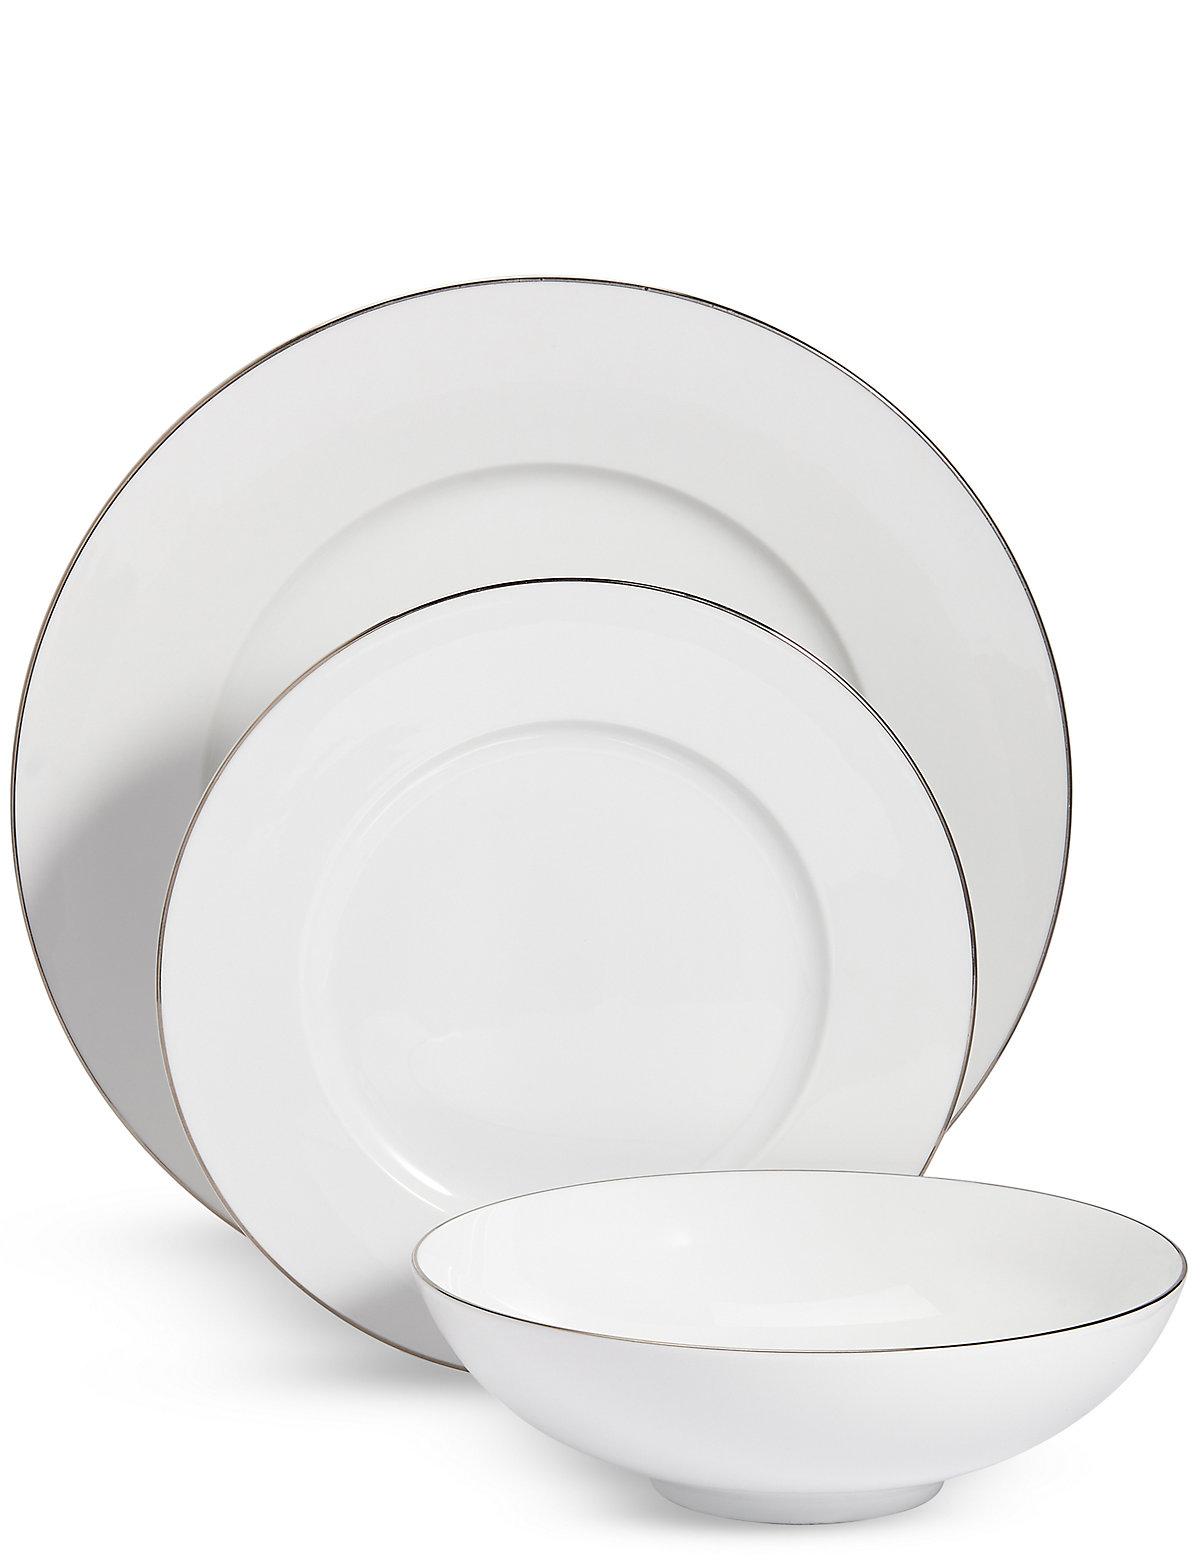 Image of 12 Piece Maxim Platinum Dinner Set